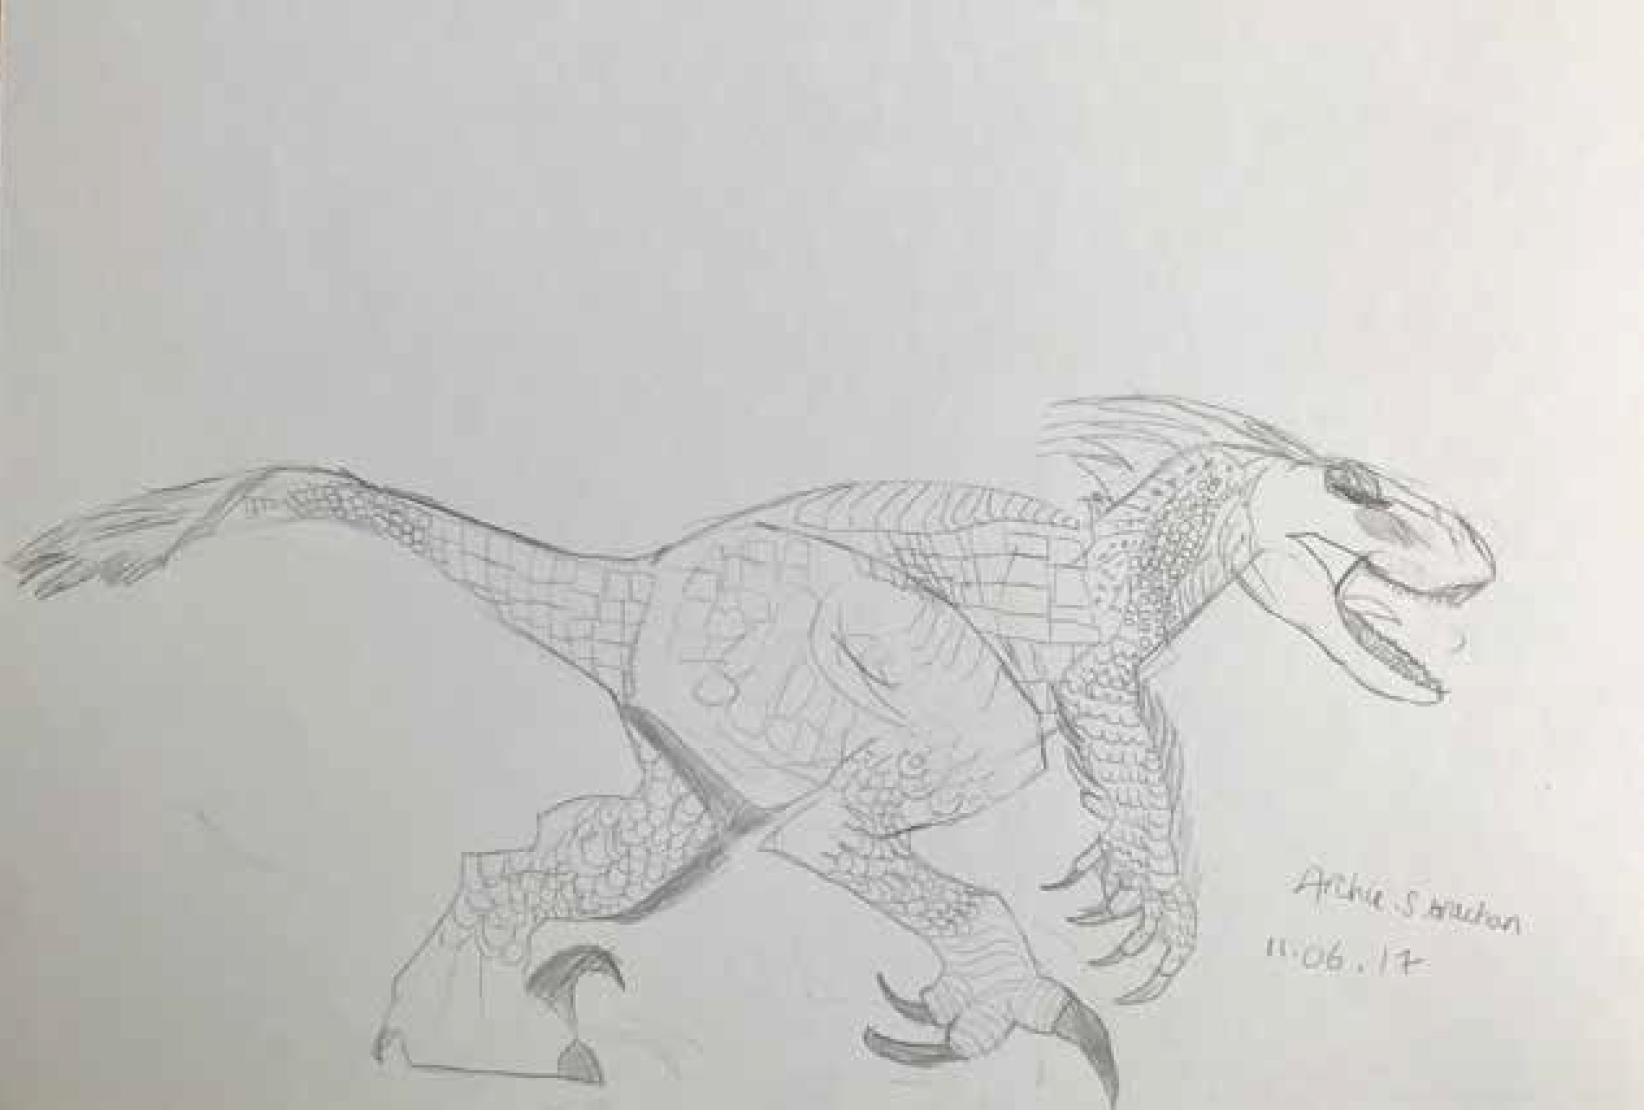 Archie's Dinosaur - 2017